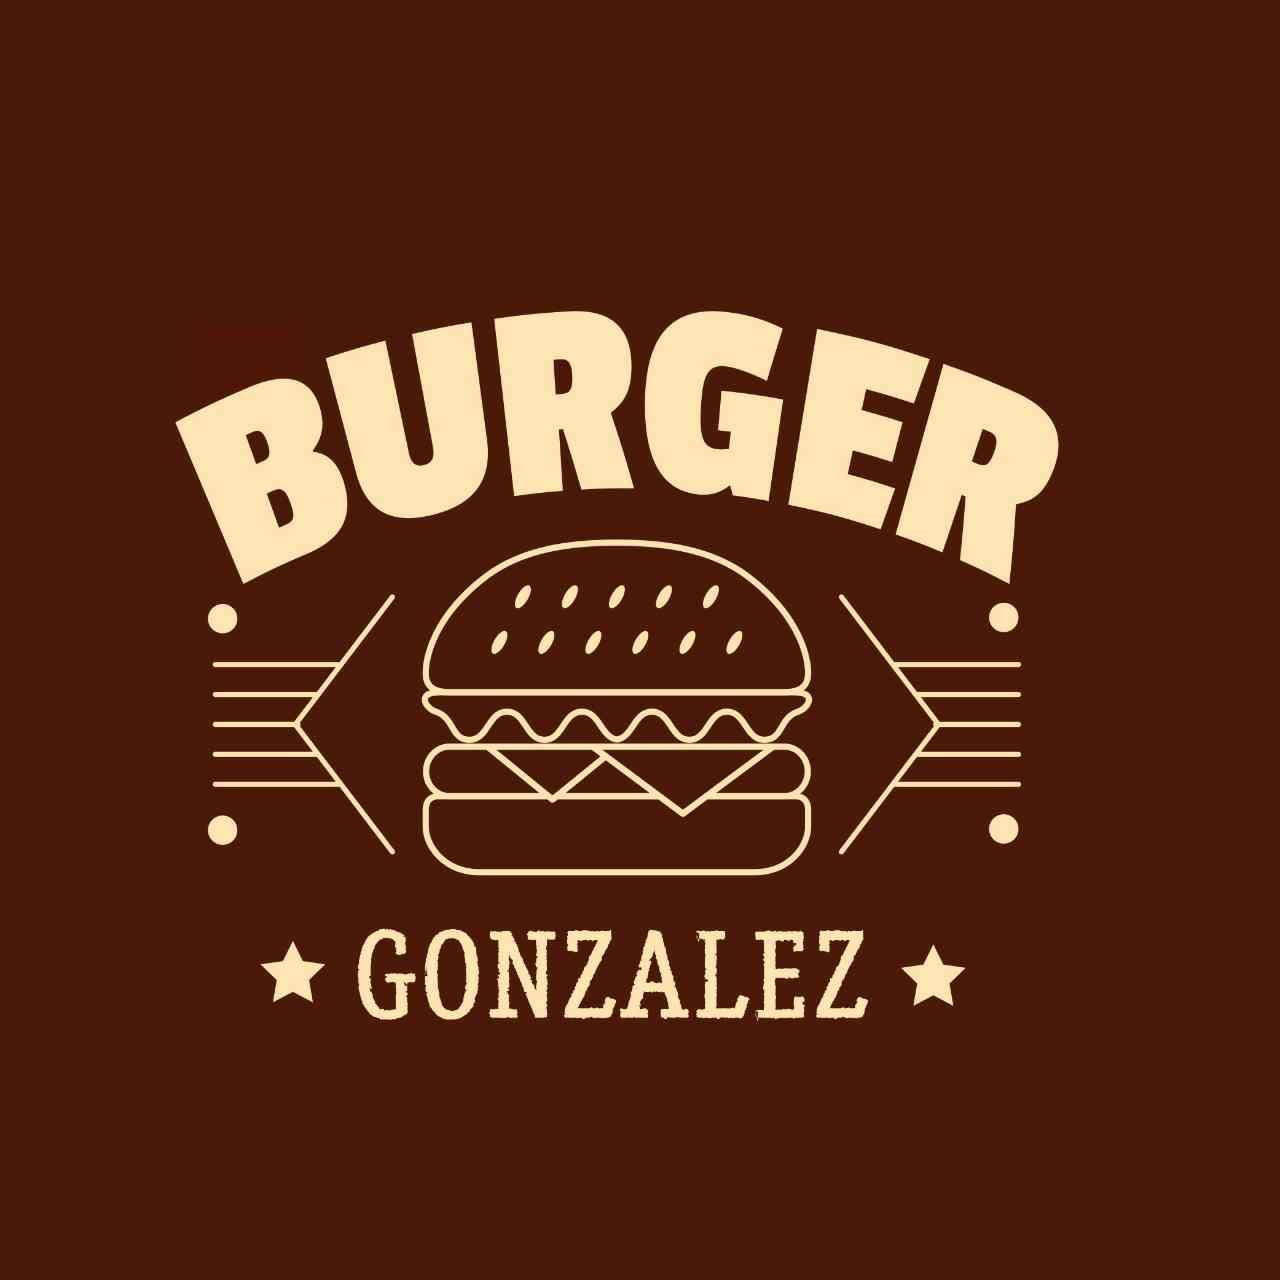 Gonzalez Burger